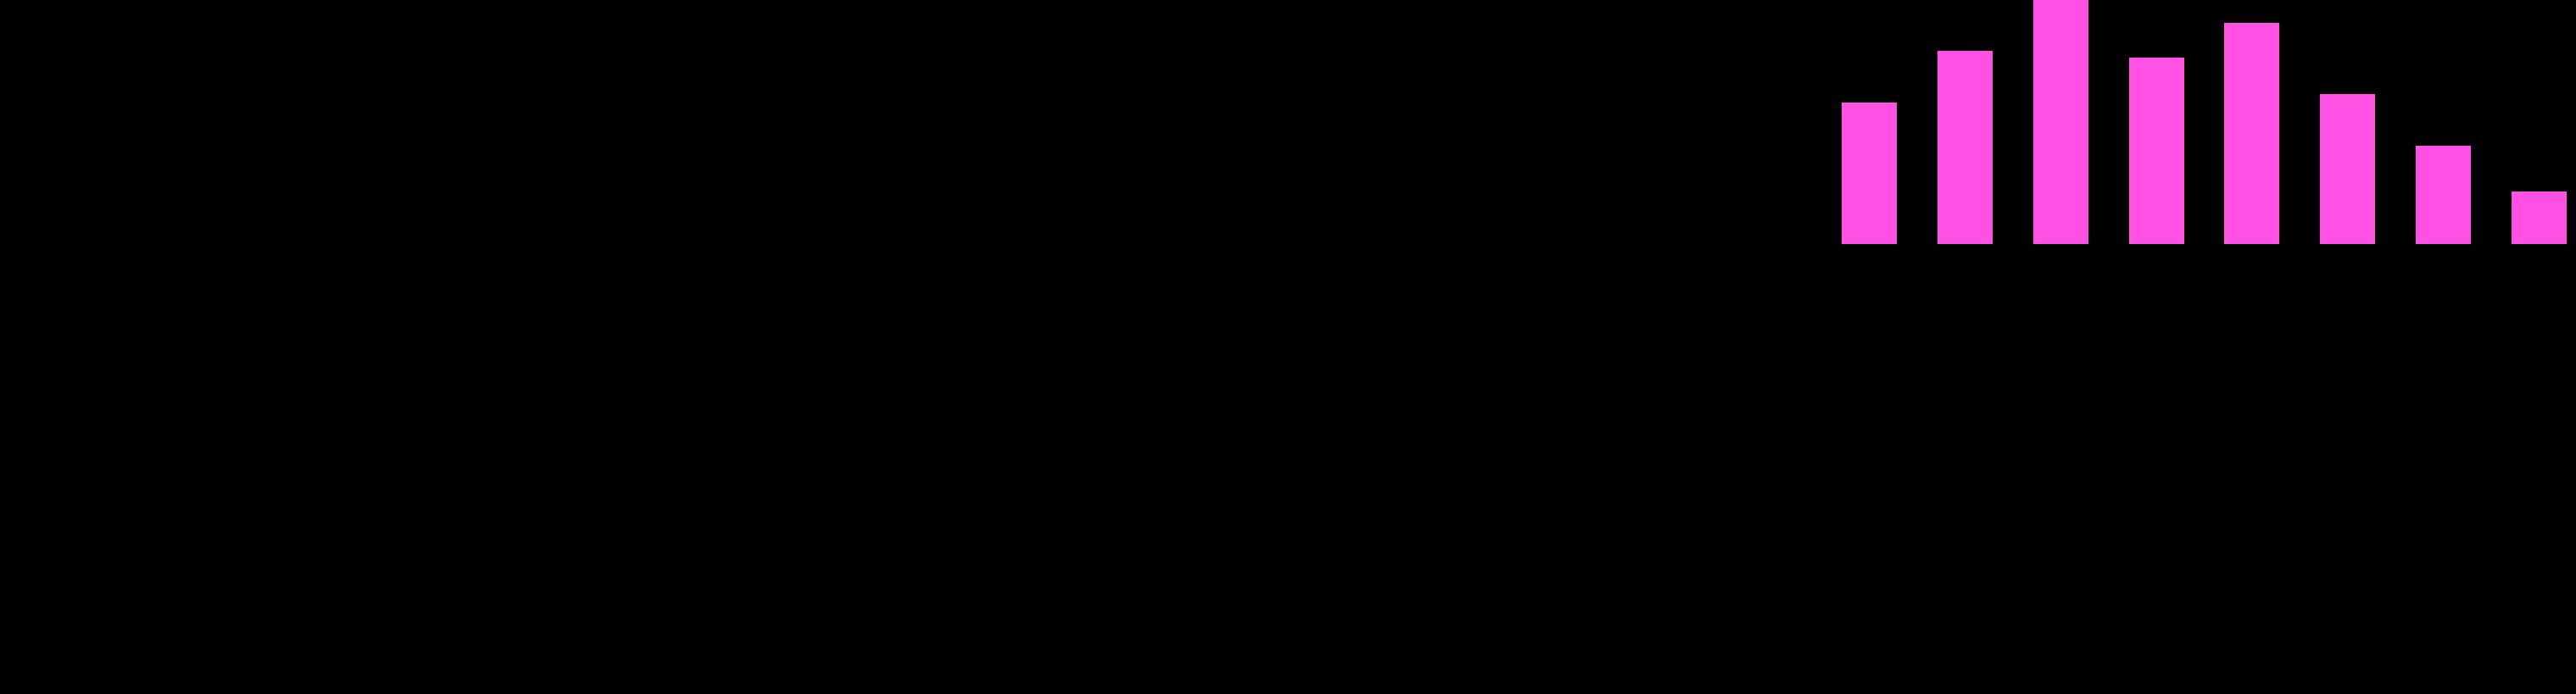 MarketerLive logo-1